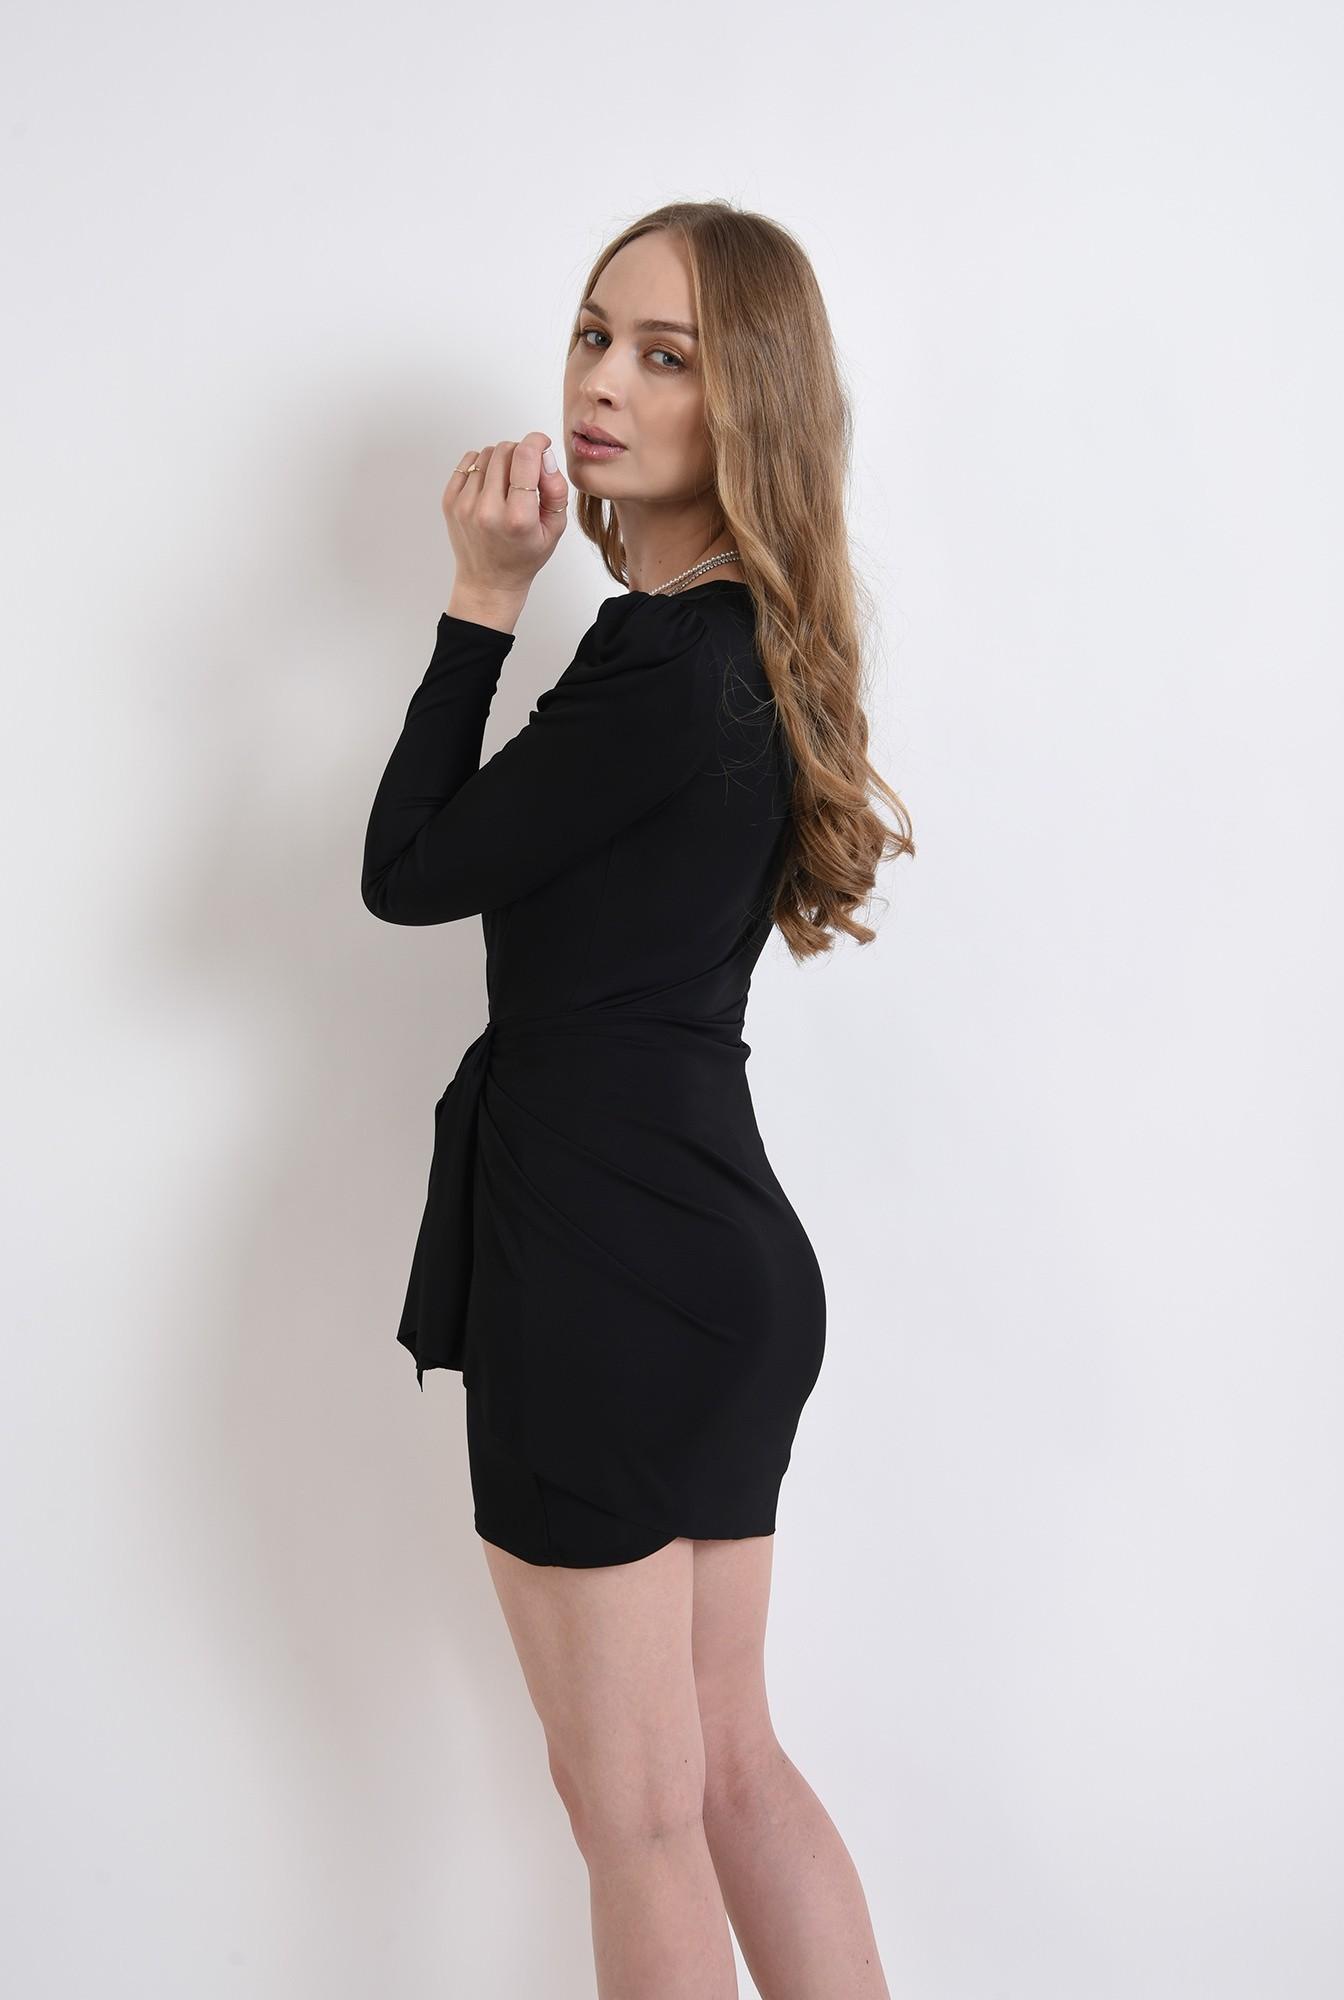 2 - rochie scurta, decoltata, din lycra